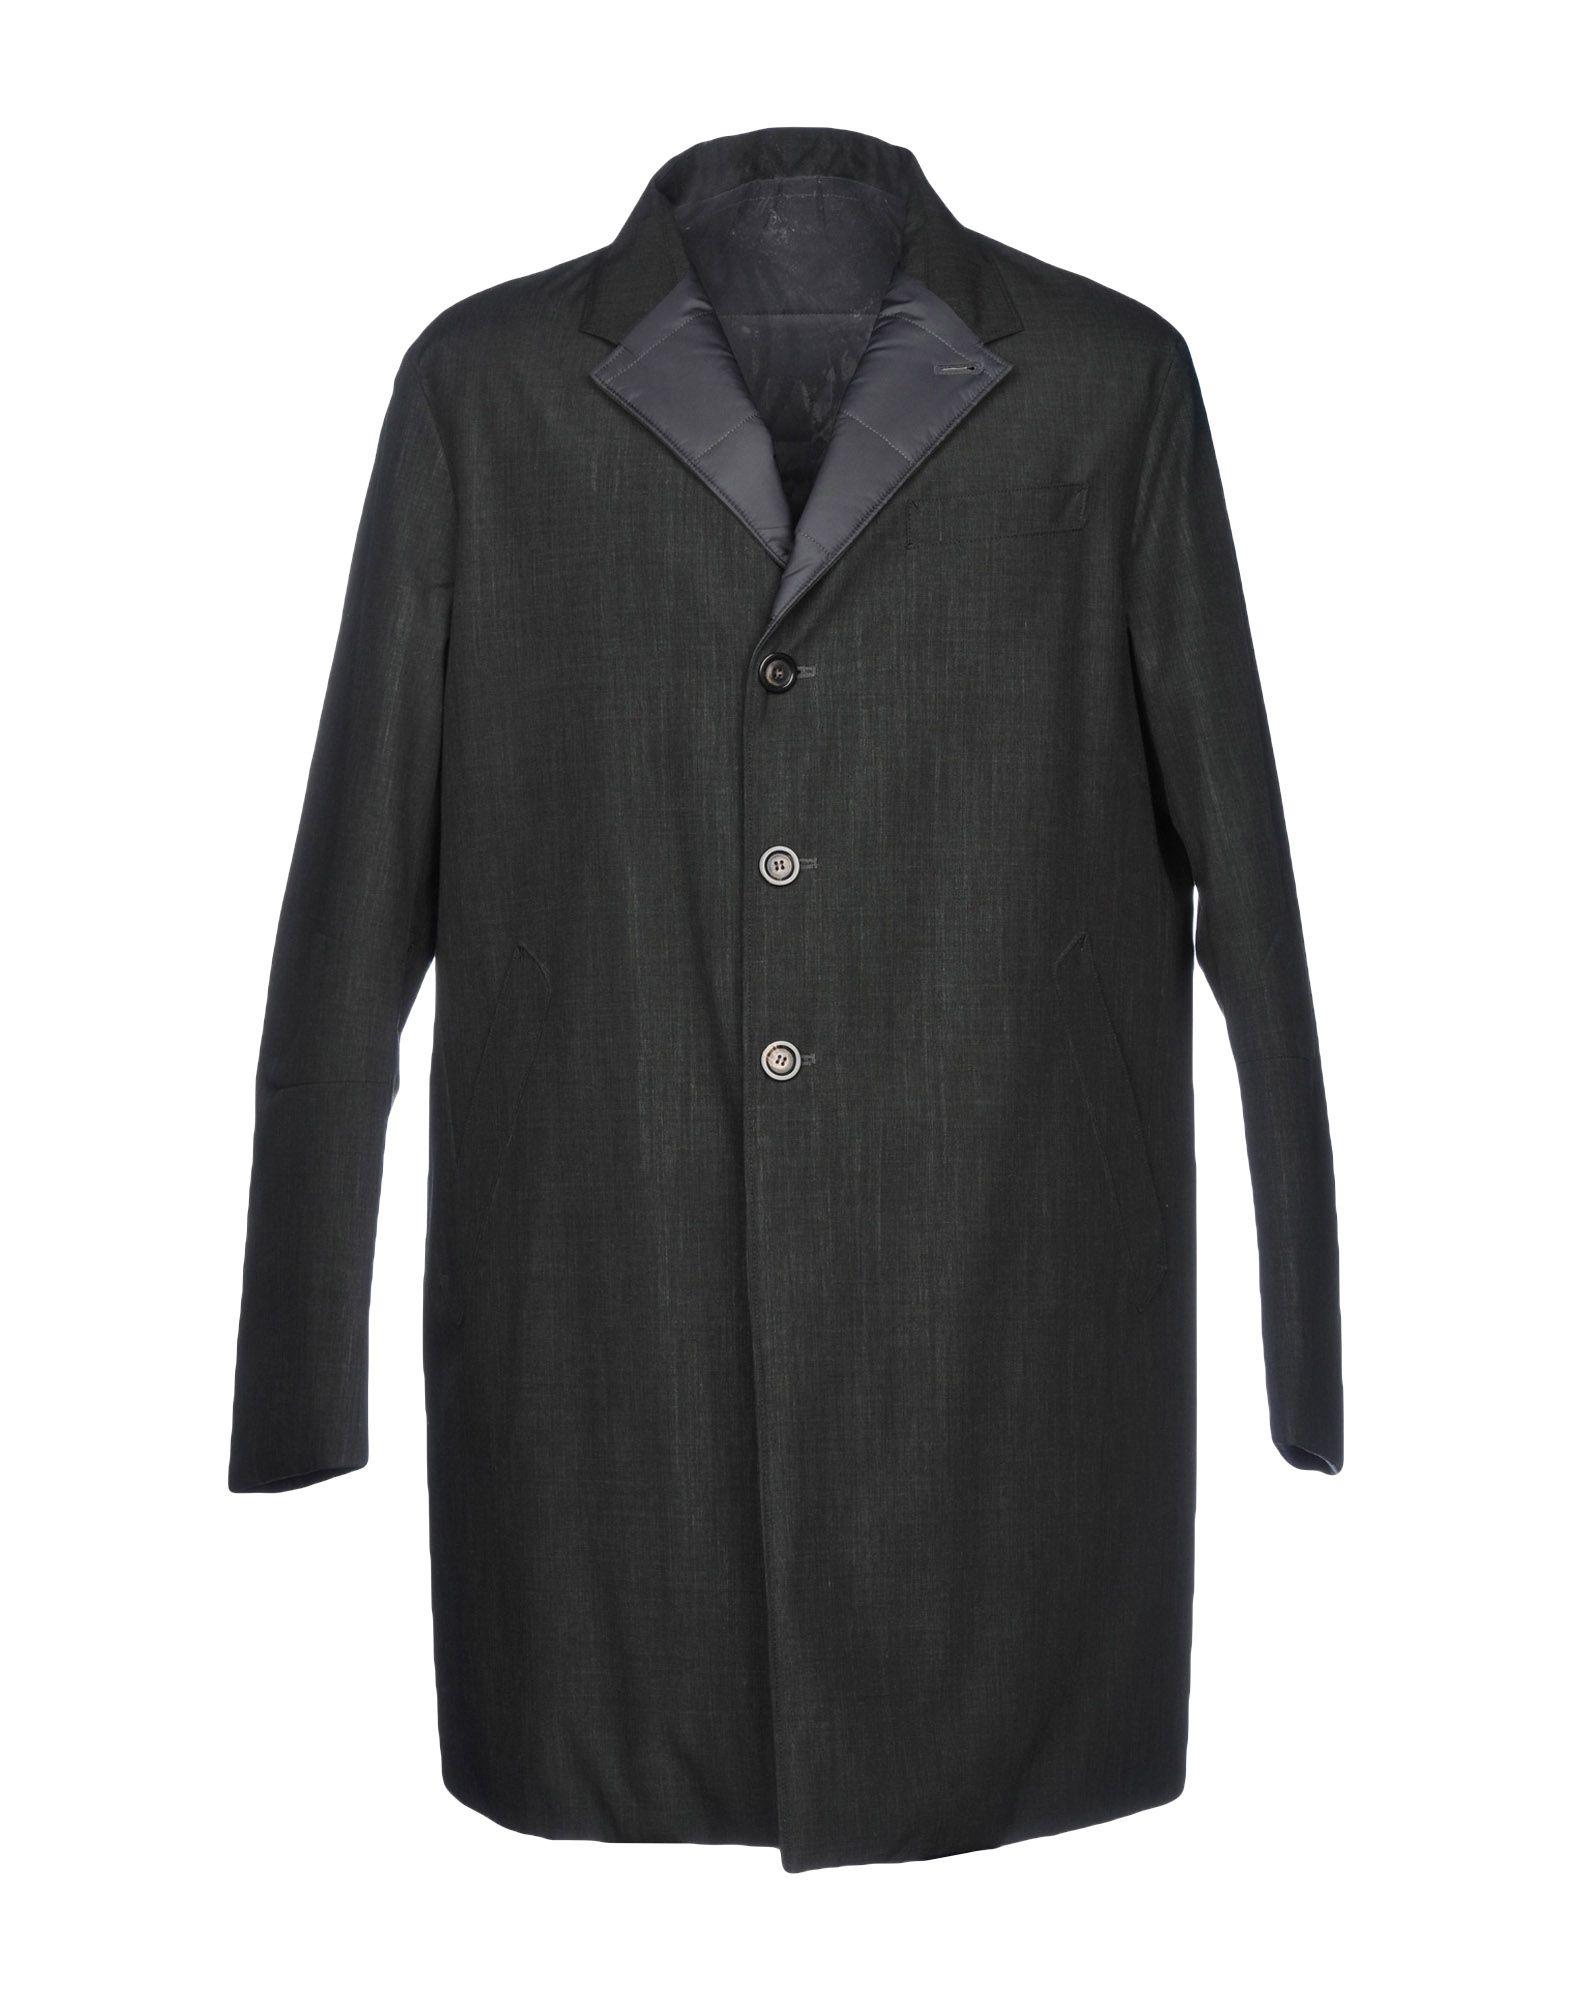 ESEMPLARE Jacket in Steel Grey